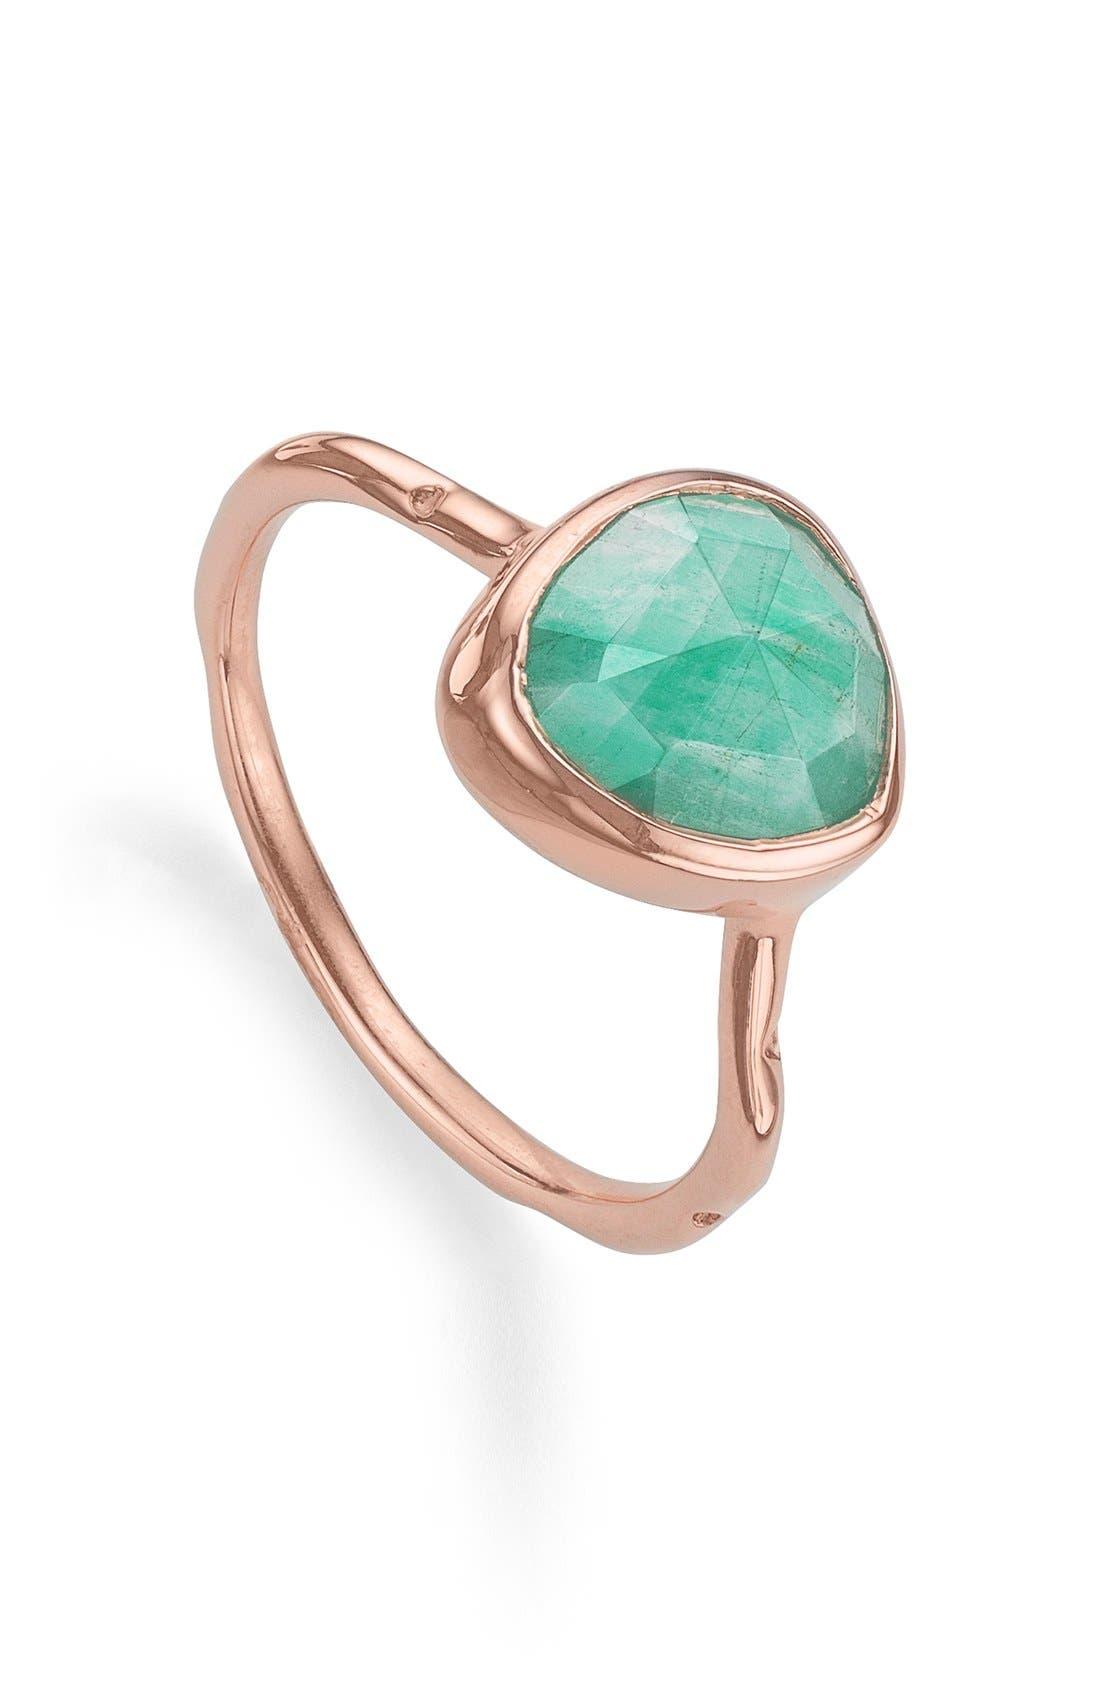 Siren Semiprecious Stone Stacking Ring,                         Main,                         color, ROSE GOLD/ AMAZONITE